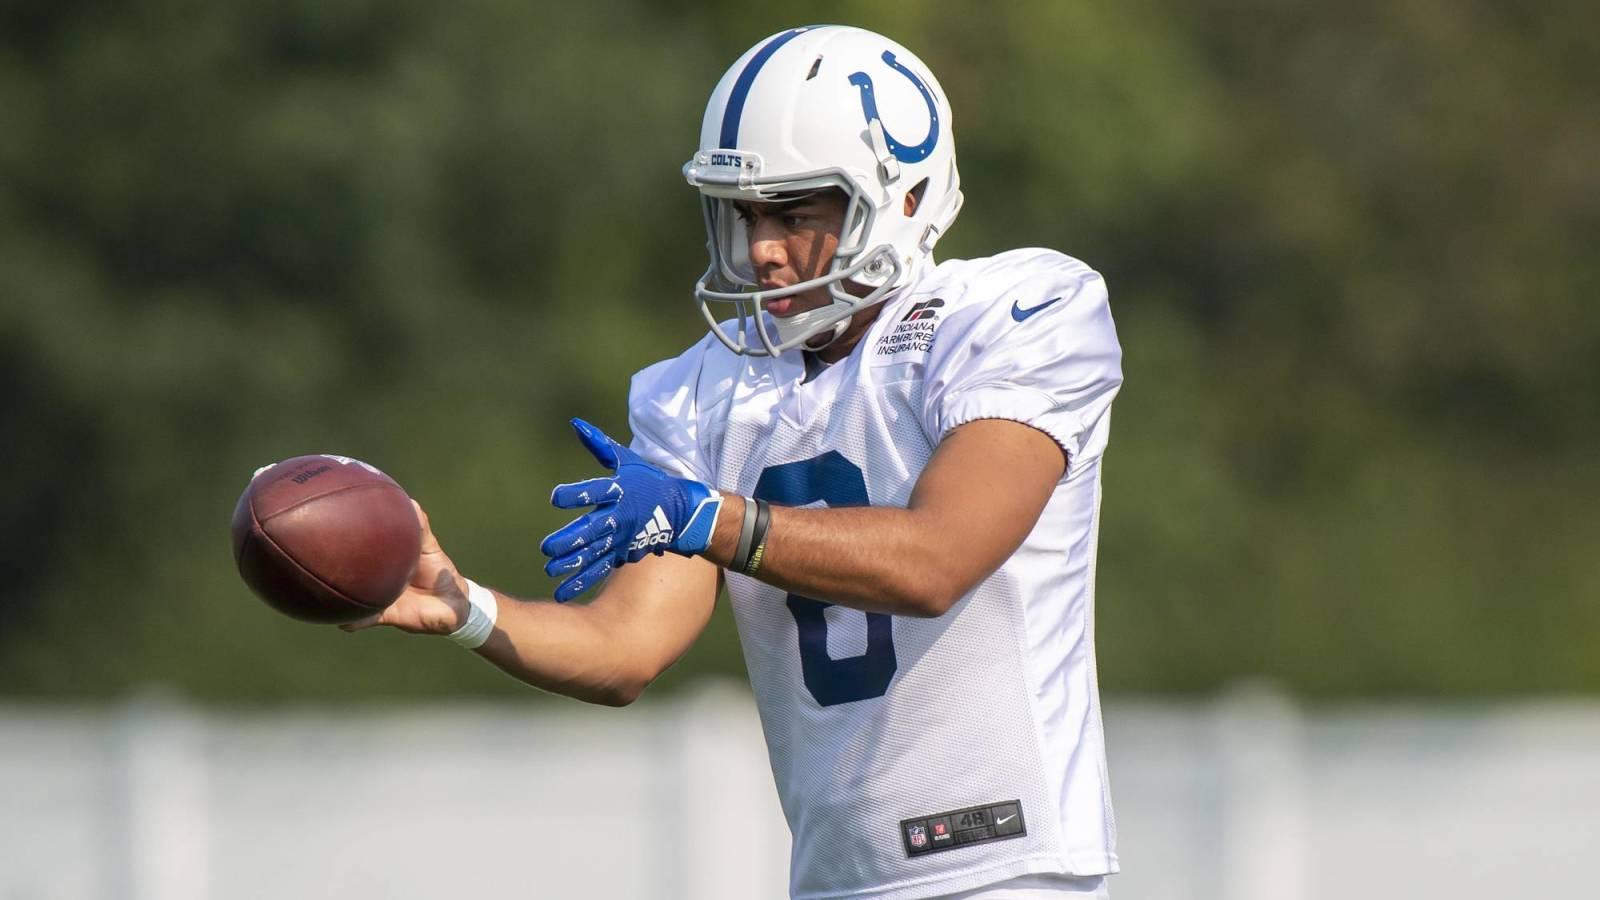 Colts punter Rigoberto Sanchez to undergo surgery to remove cancerous tumor